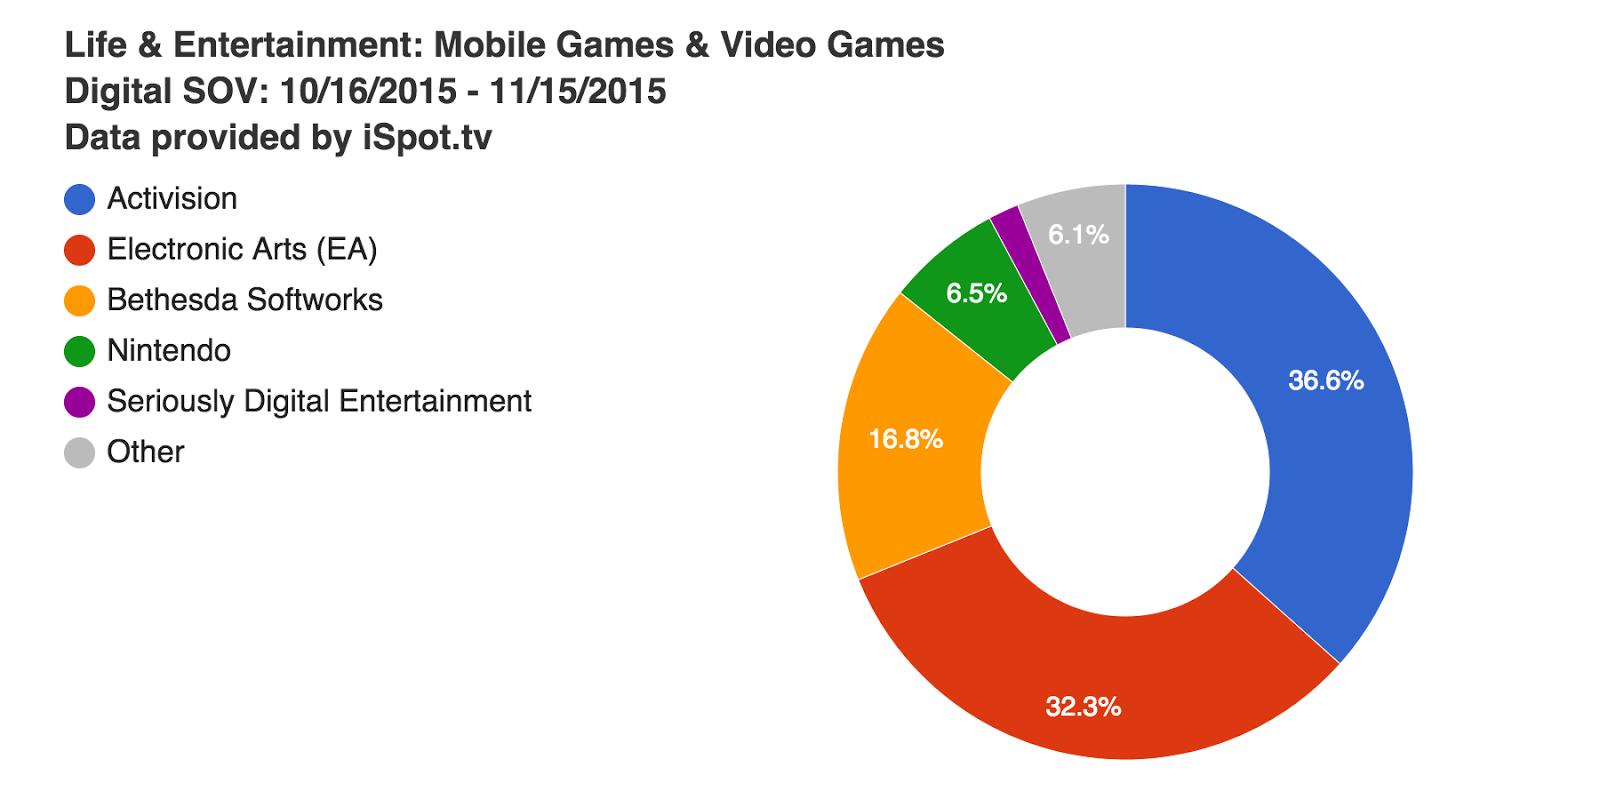 life--entertainment-mobile-games--video-games-digital-sov-10-16-2015--11-15-2015